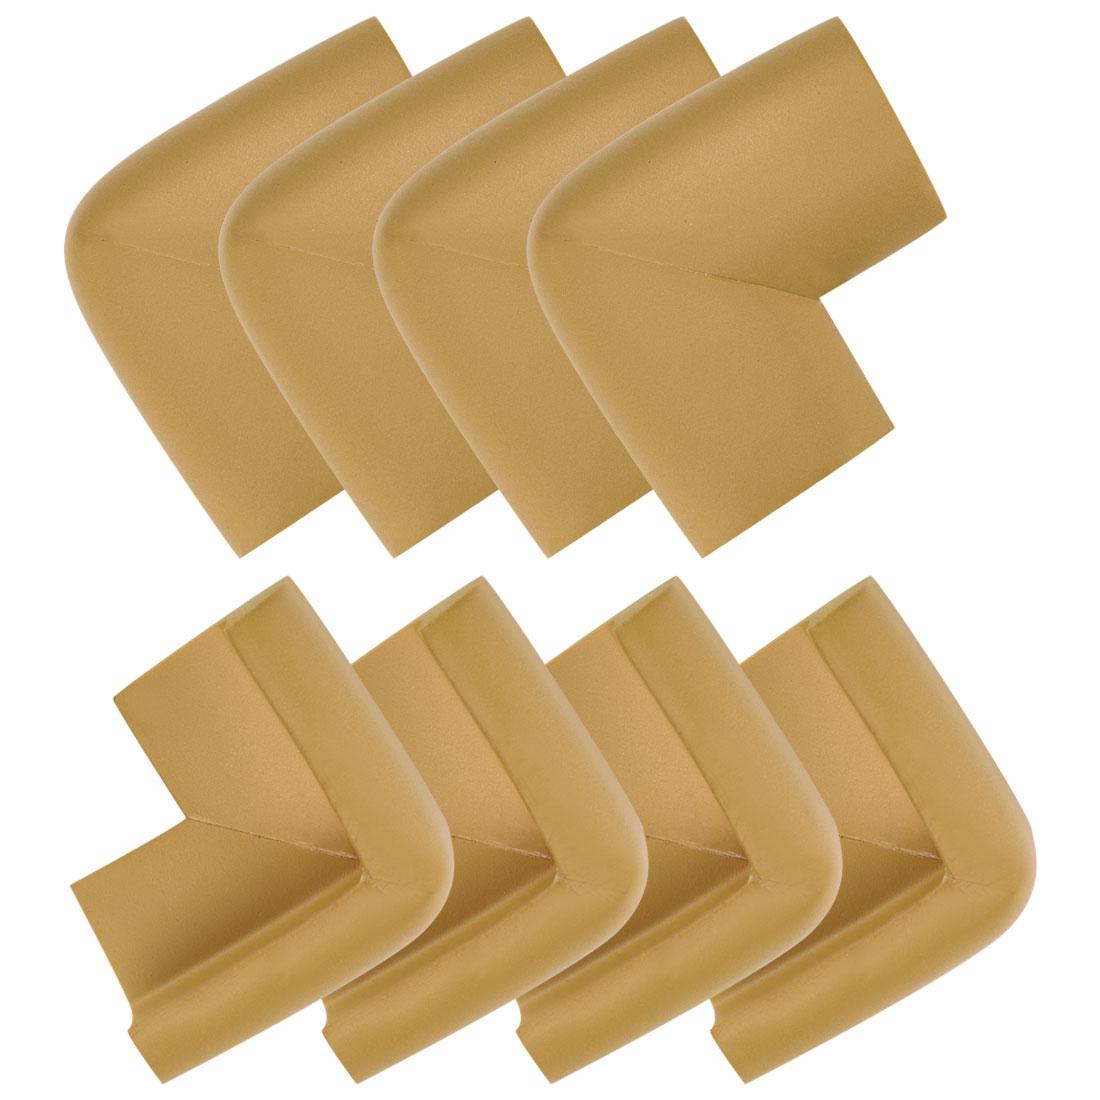 Desk Table Edge Foam Corner Cushion Guards Soft Bumper Protector 8pcs Brown